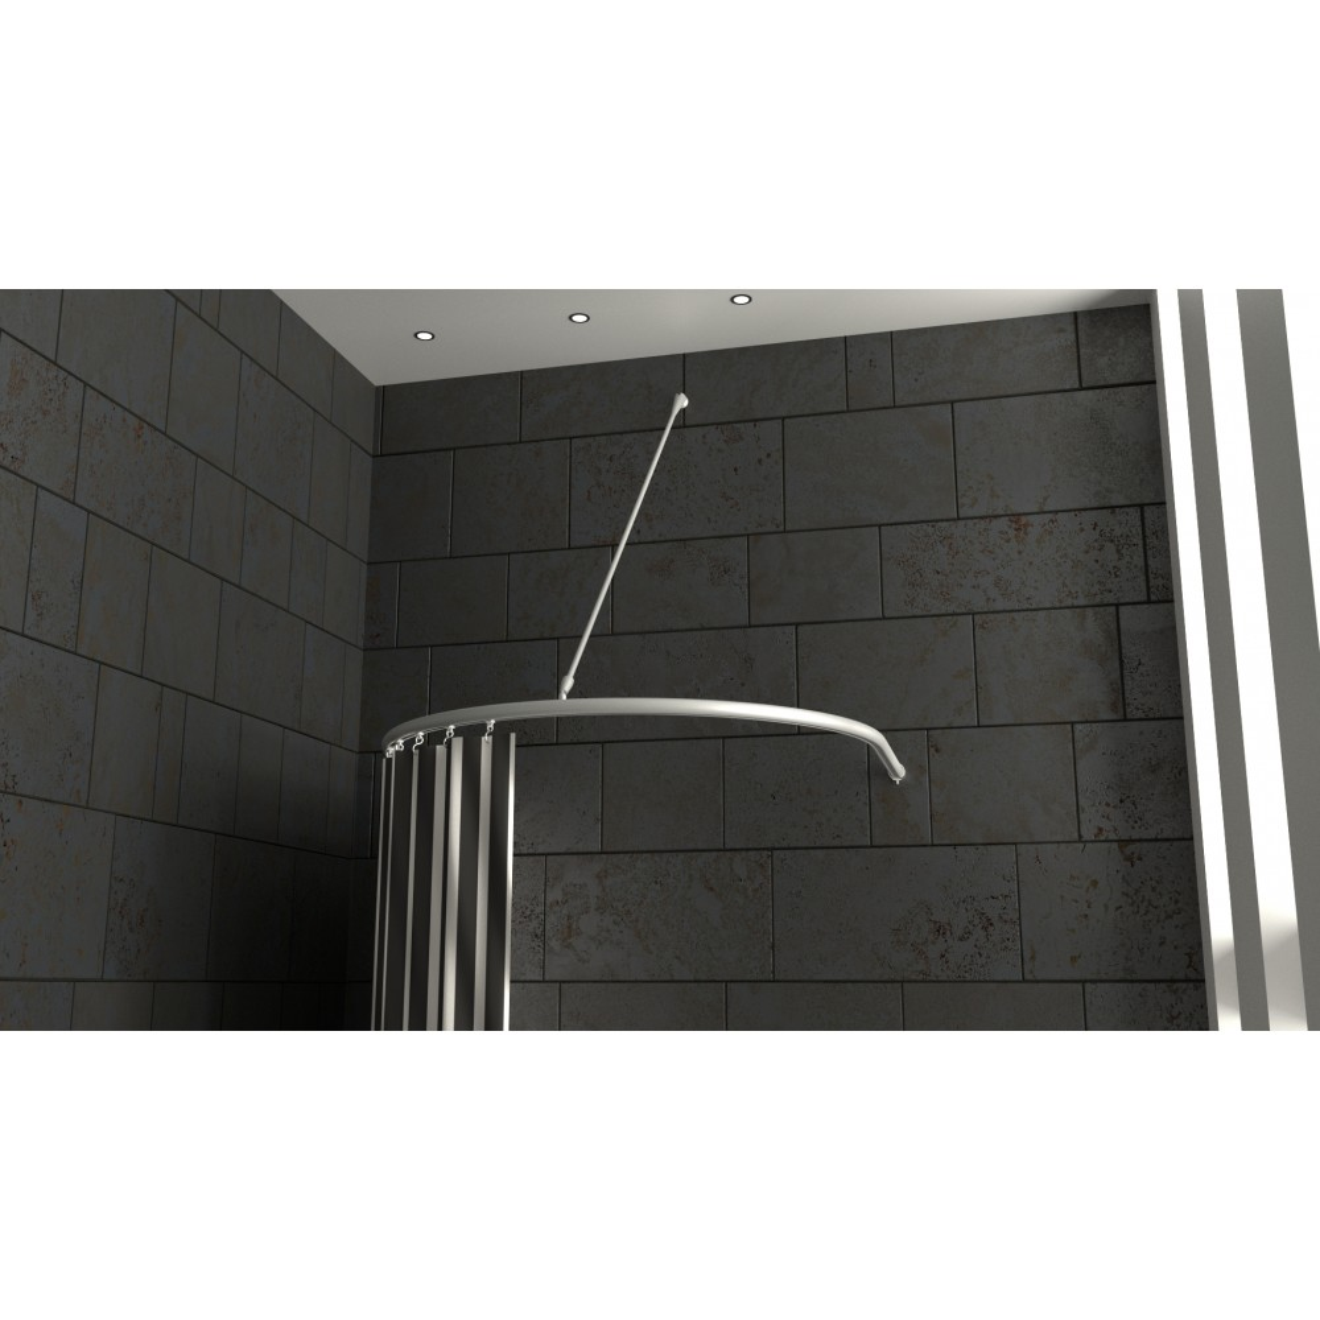 duschvorhangstange halbkreis mit wandh nger duschvorhangstange. Black Bedroom Furniture Sets. Home Design Ideas